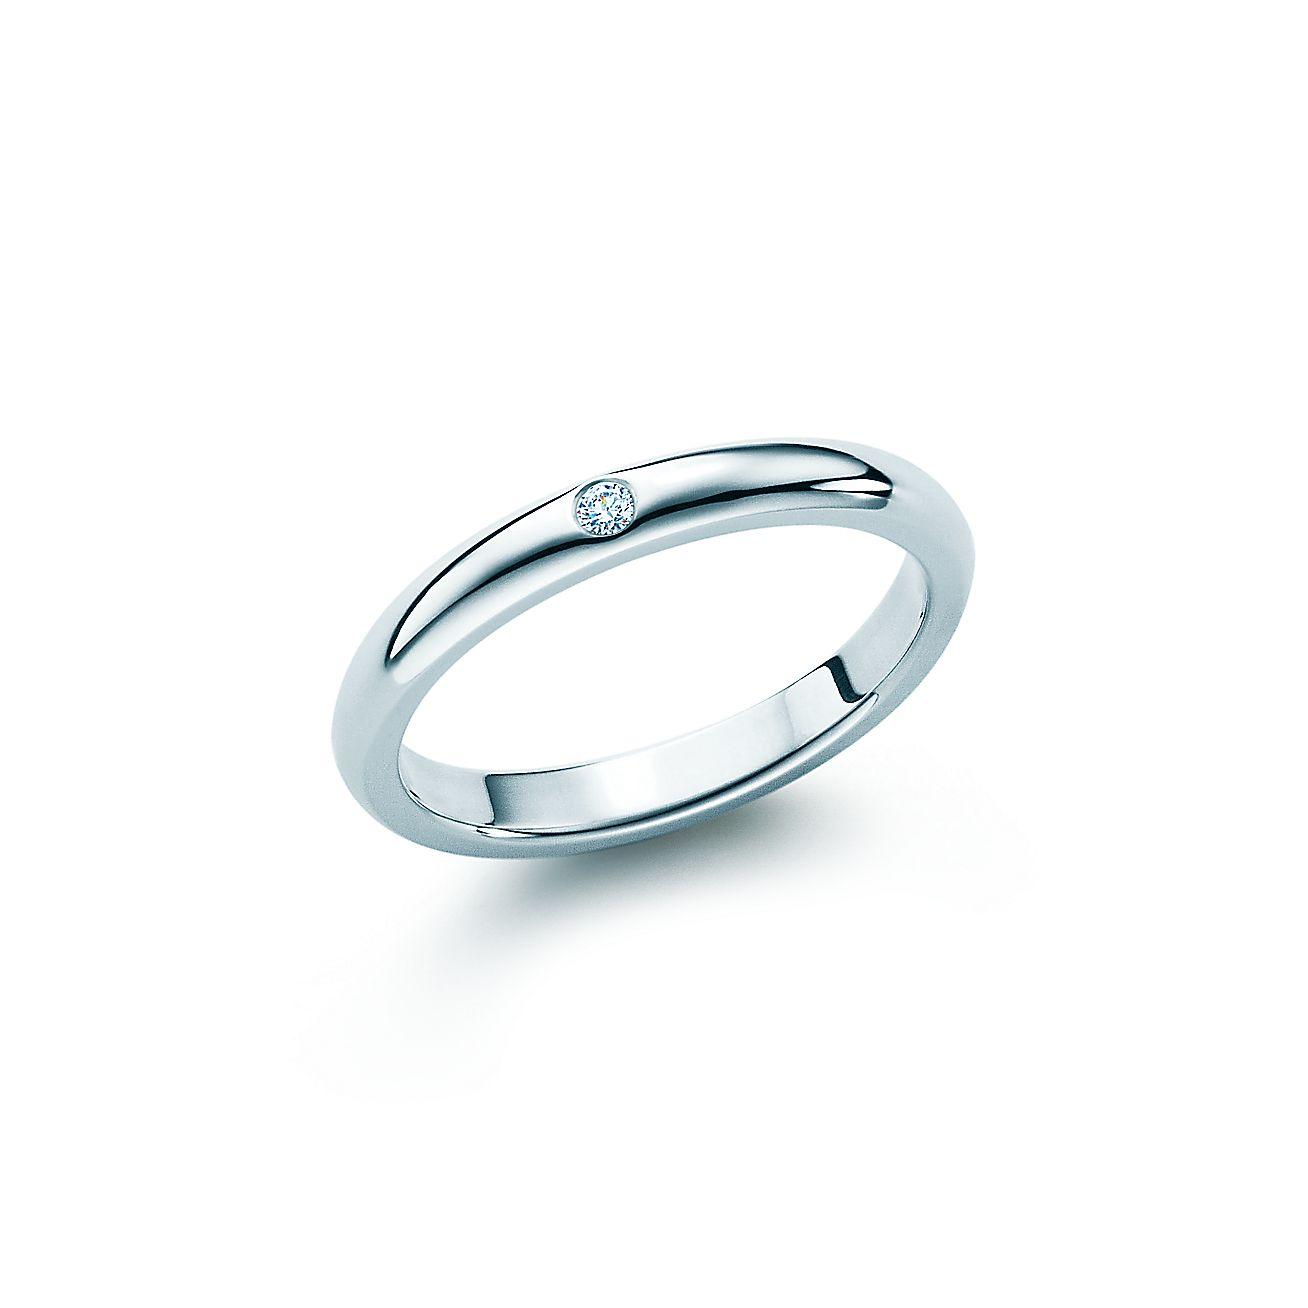 Tiffany Engagement Rings Round Elsa Peretti® ban...